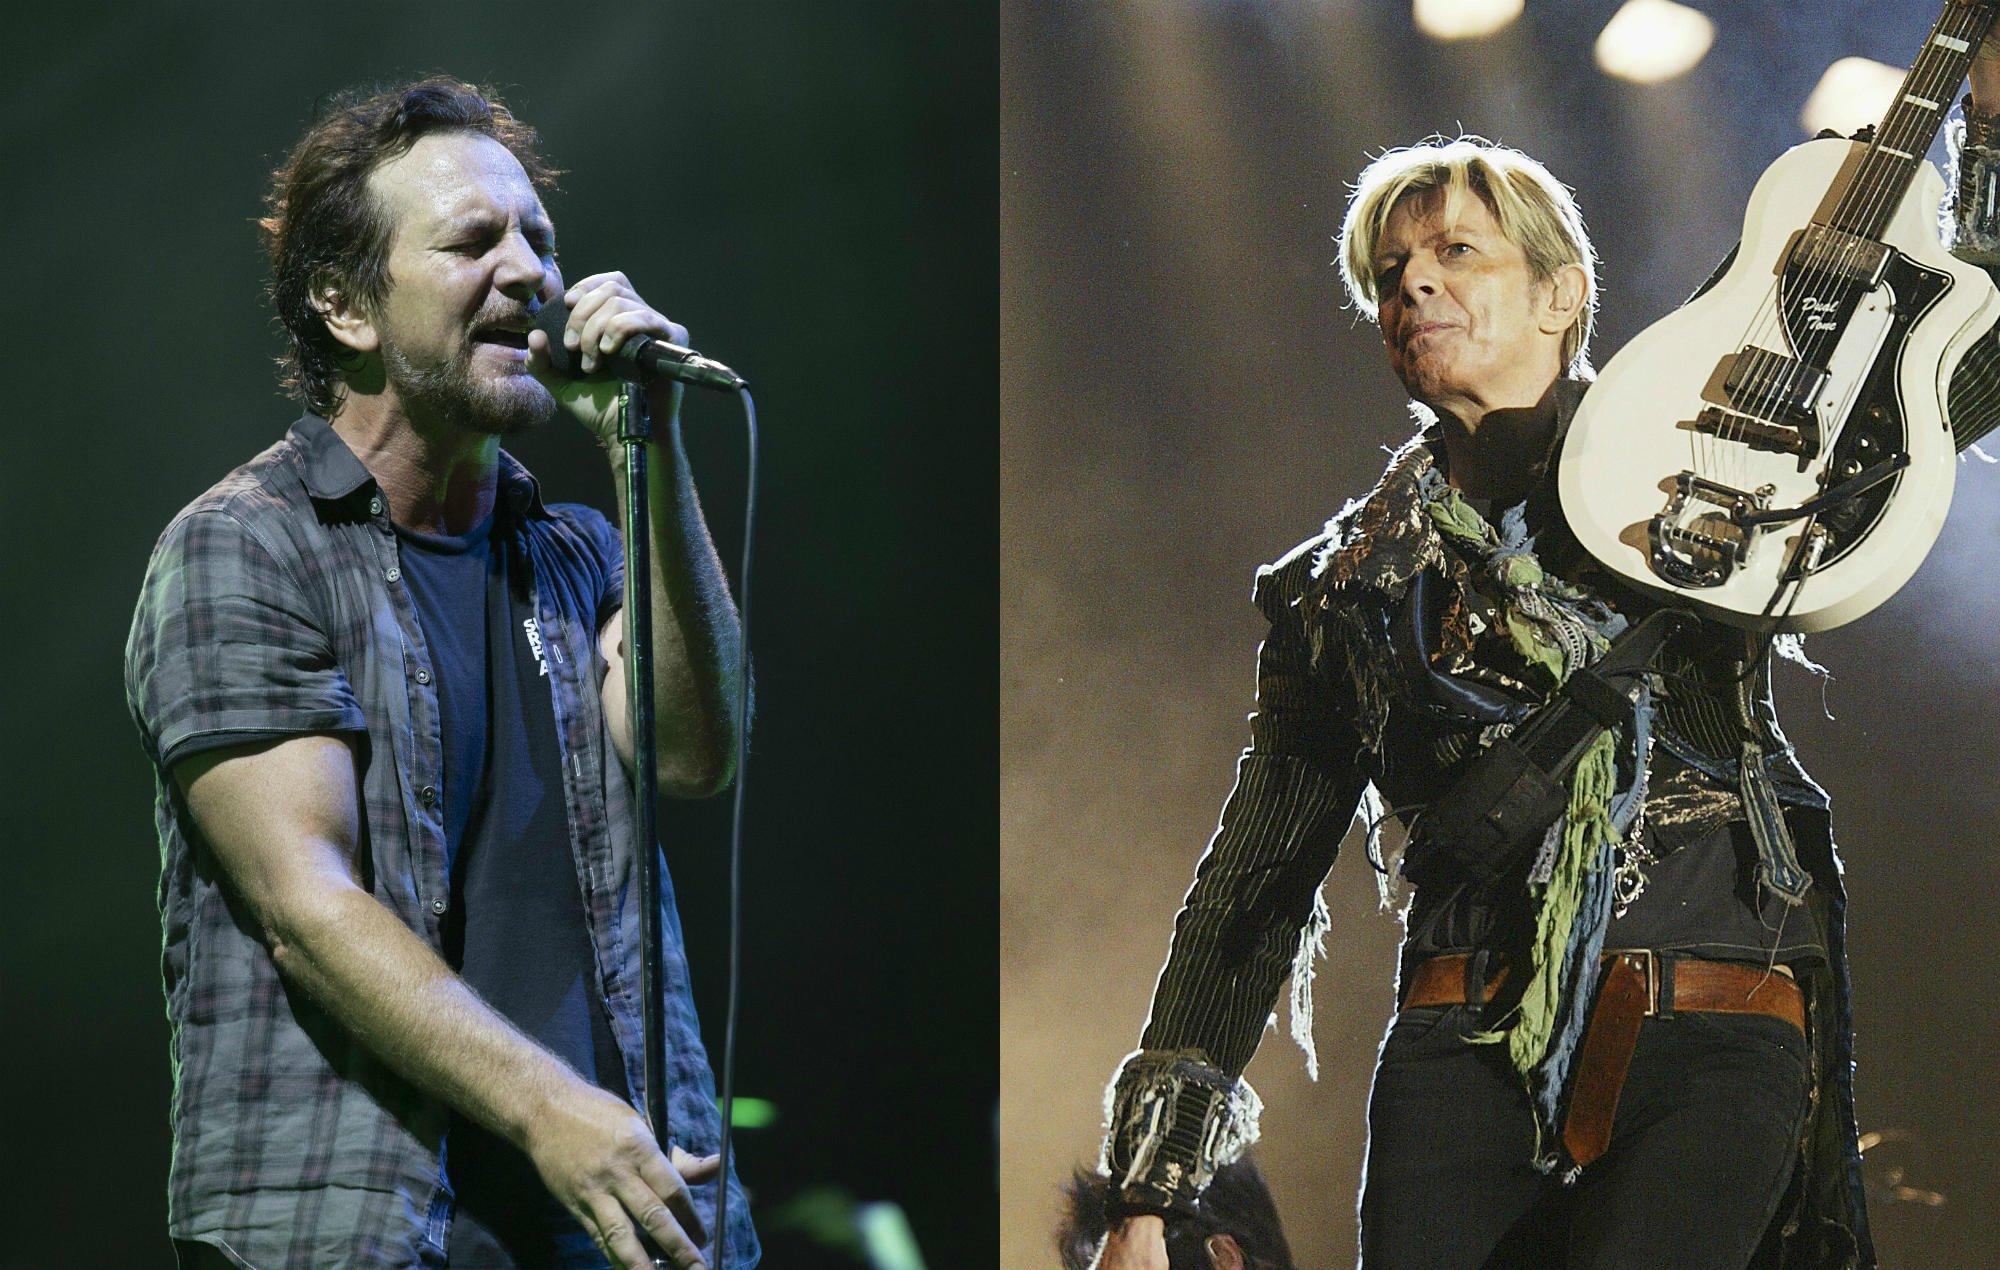 Here's Pearl Jam covering David Bowie's 'Rebel Rebel' https://t.co/fbZgUL1Ujv https://t.co/X74IDLgD4V